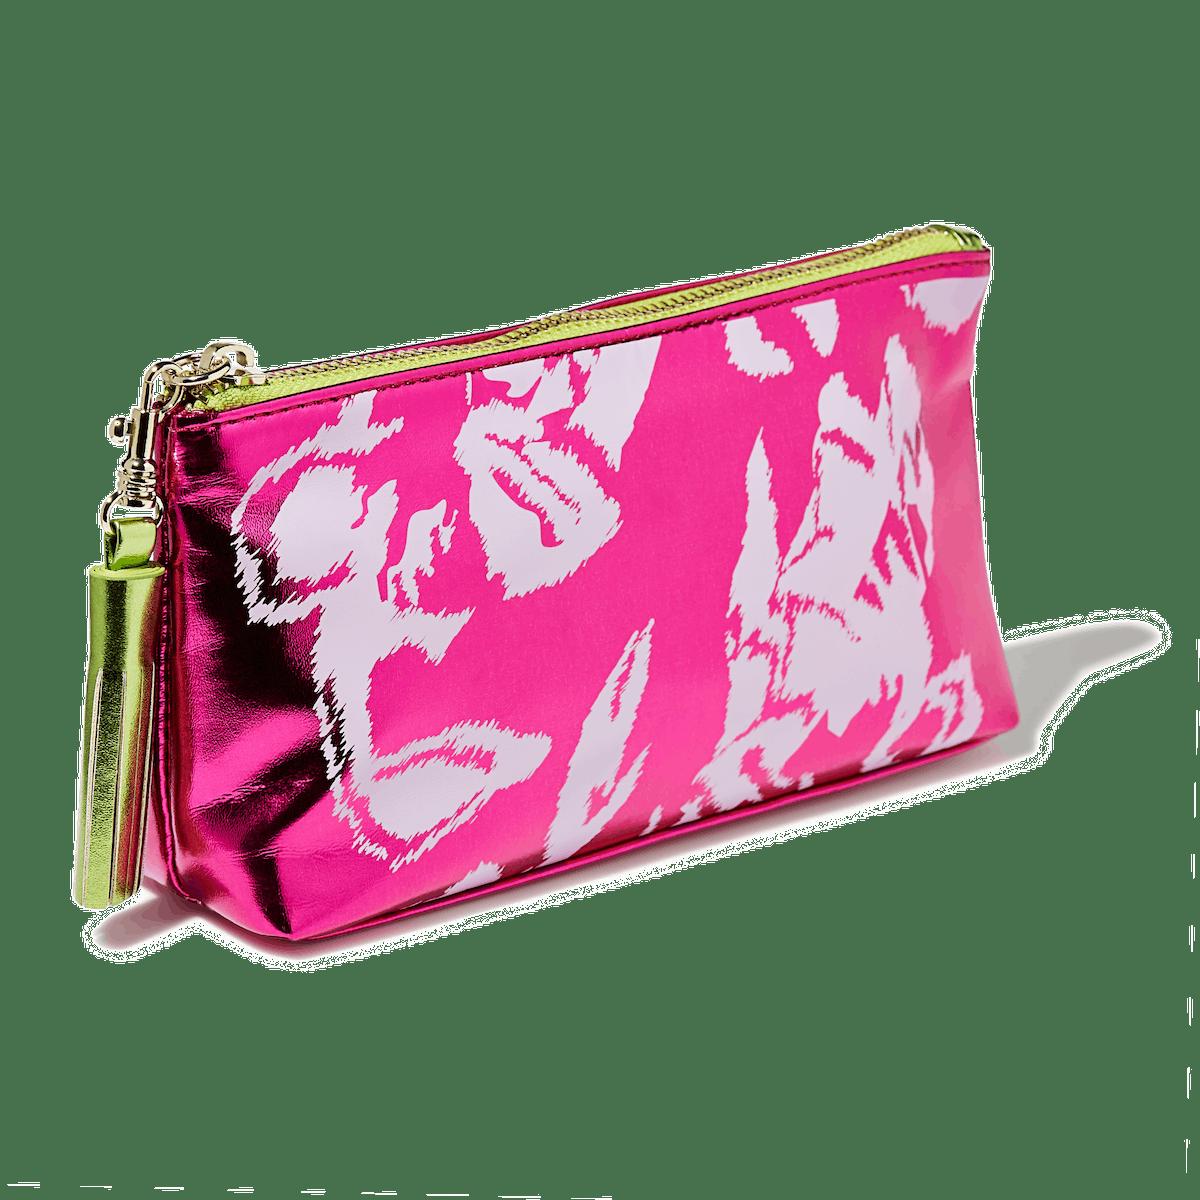 Christian Siriano Cosmetic Bag